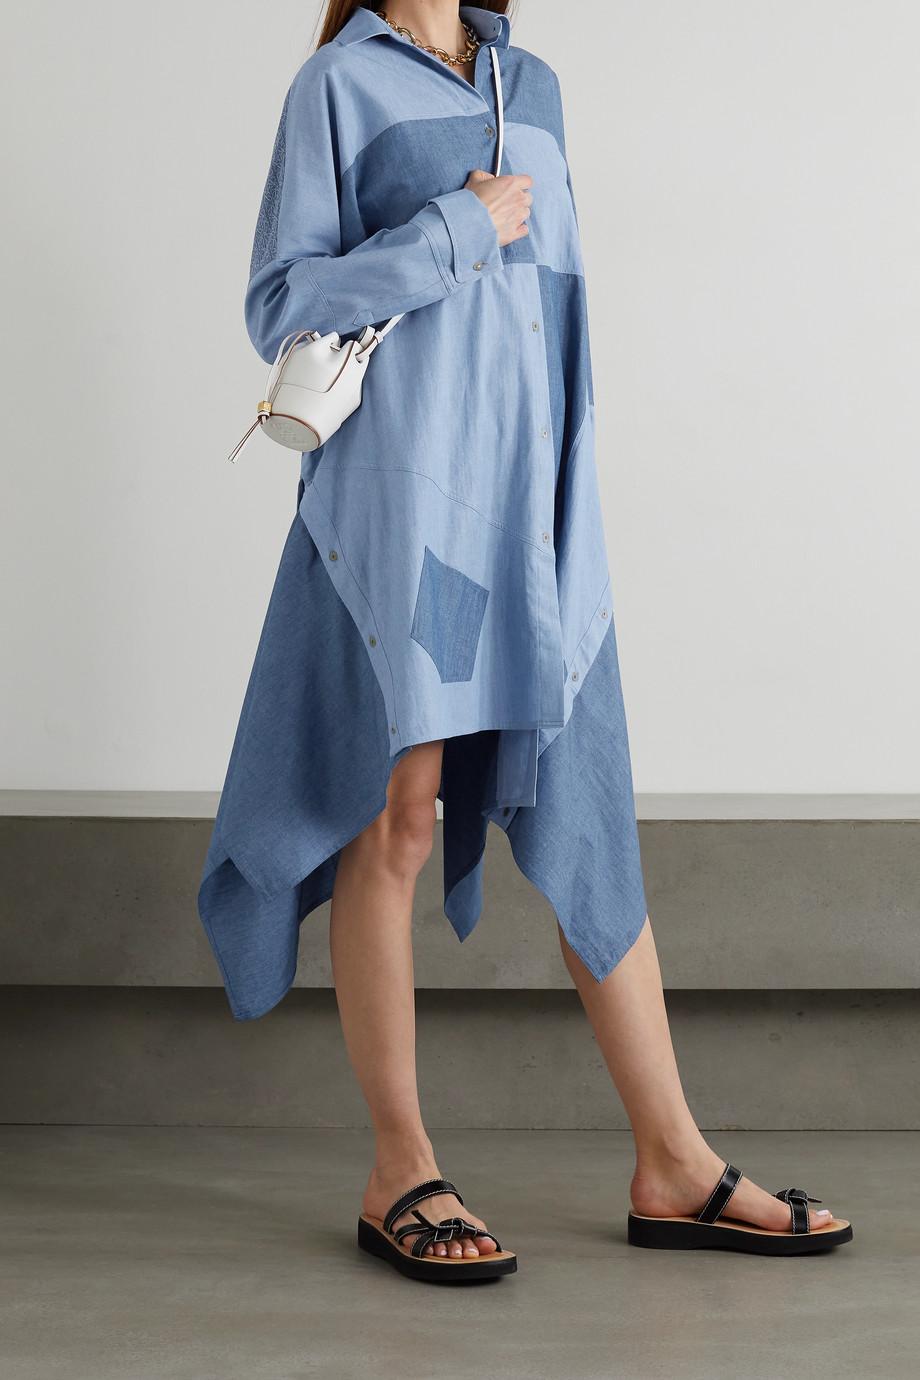 Loewe Asymmetric patchwork cotton-chambray shirt dress